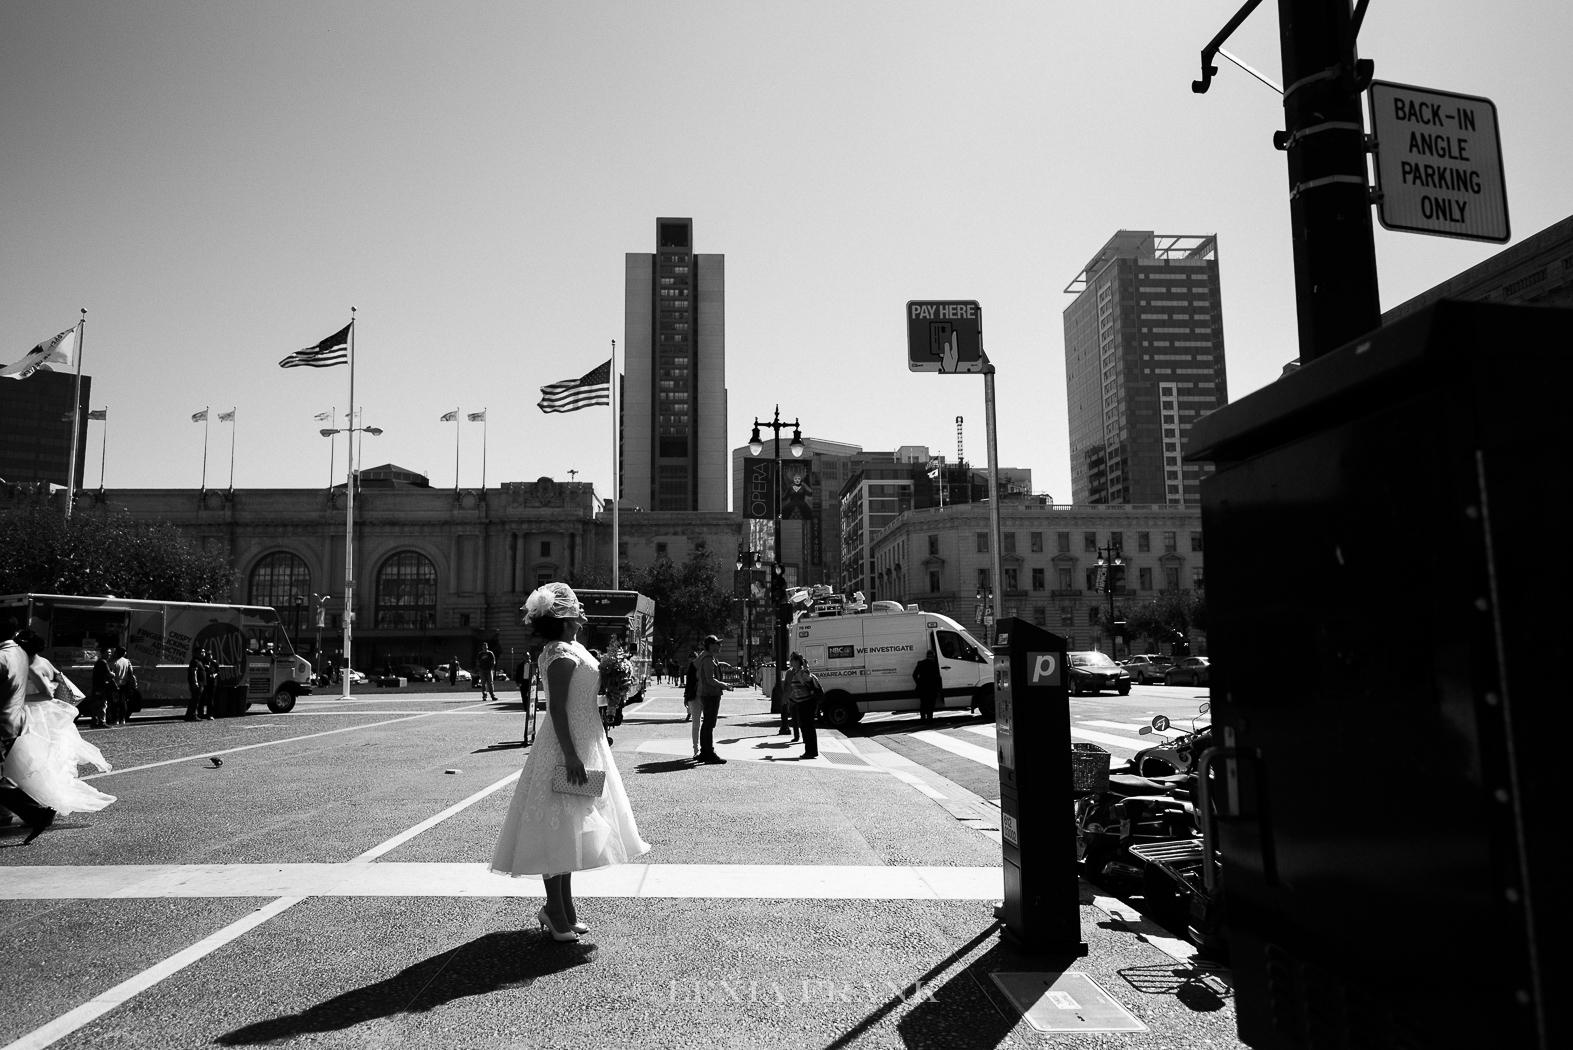 Destination Wedding Photographer LExia Frank - a portland oregon fine art film photographer- documents this San Francisco City Hall wedding as the bride heads to the courthouse. www.lexiafrank.com